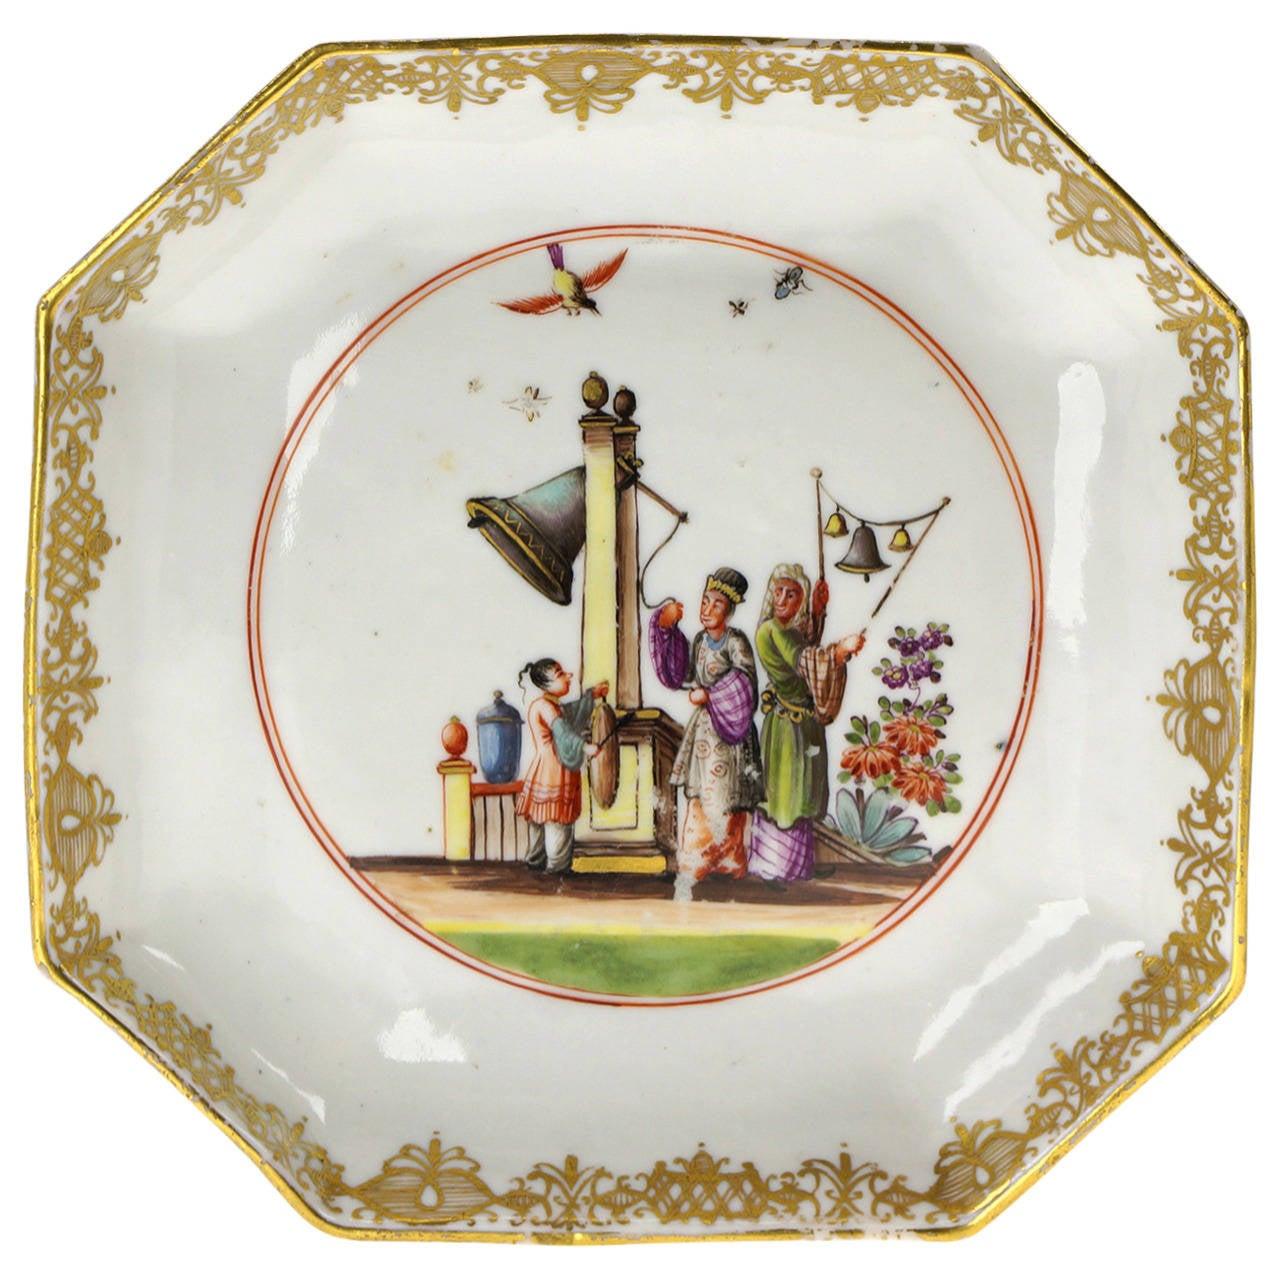 Meissen Octagonal Dish, Chinoiserie in the Manner of J.G.Höroldt, circa 1735